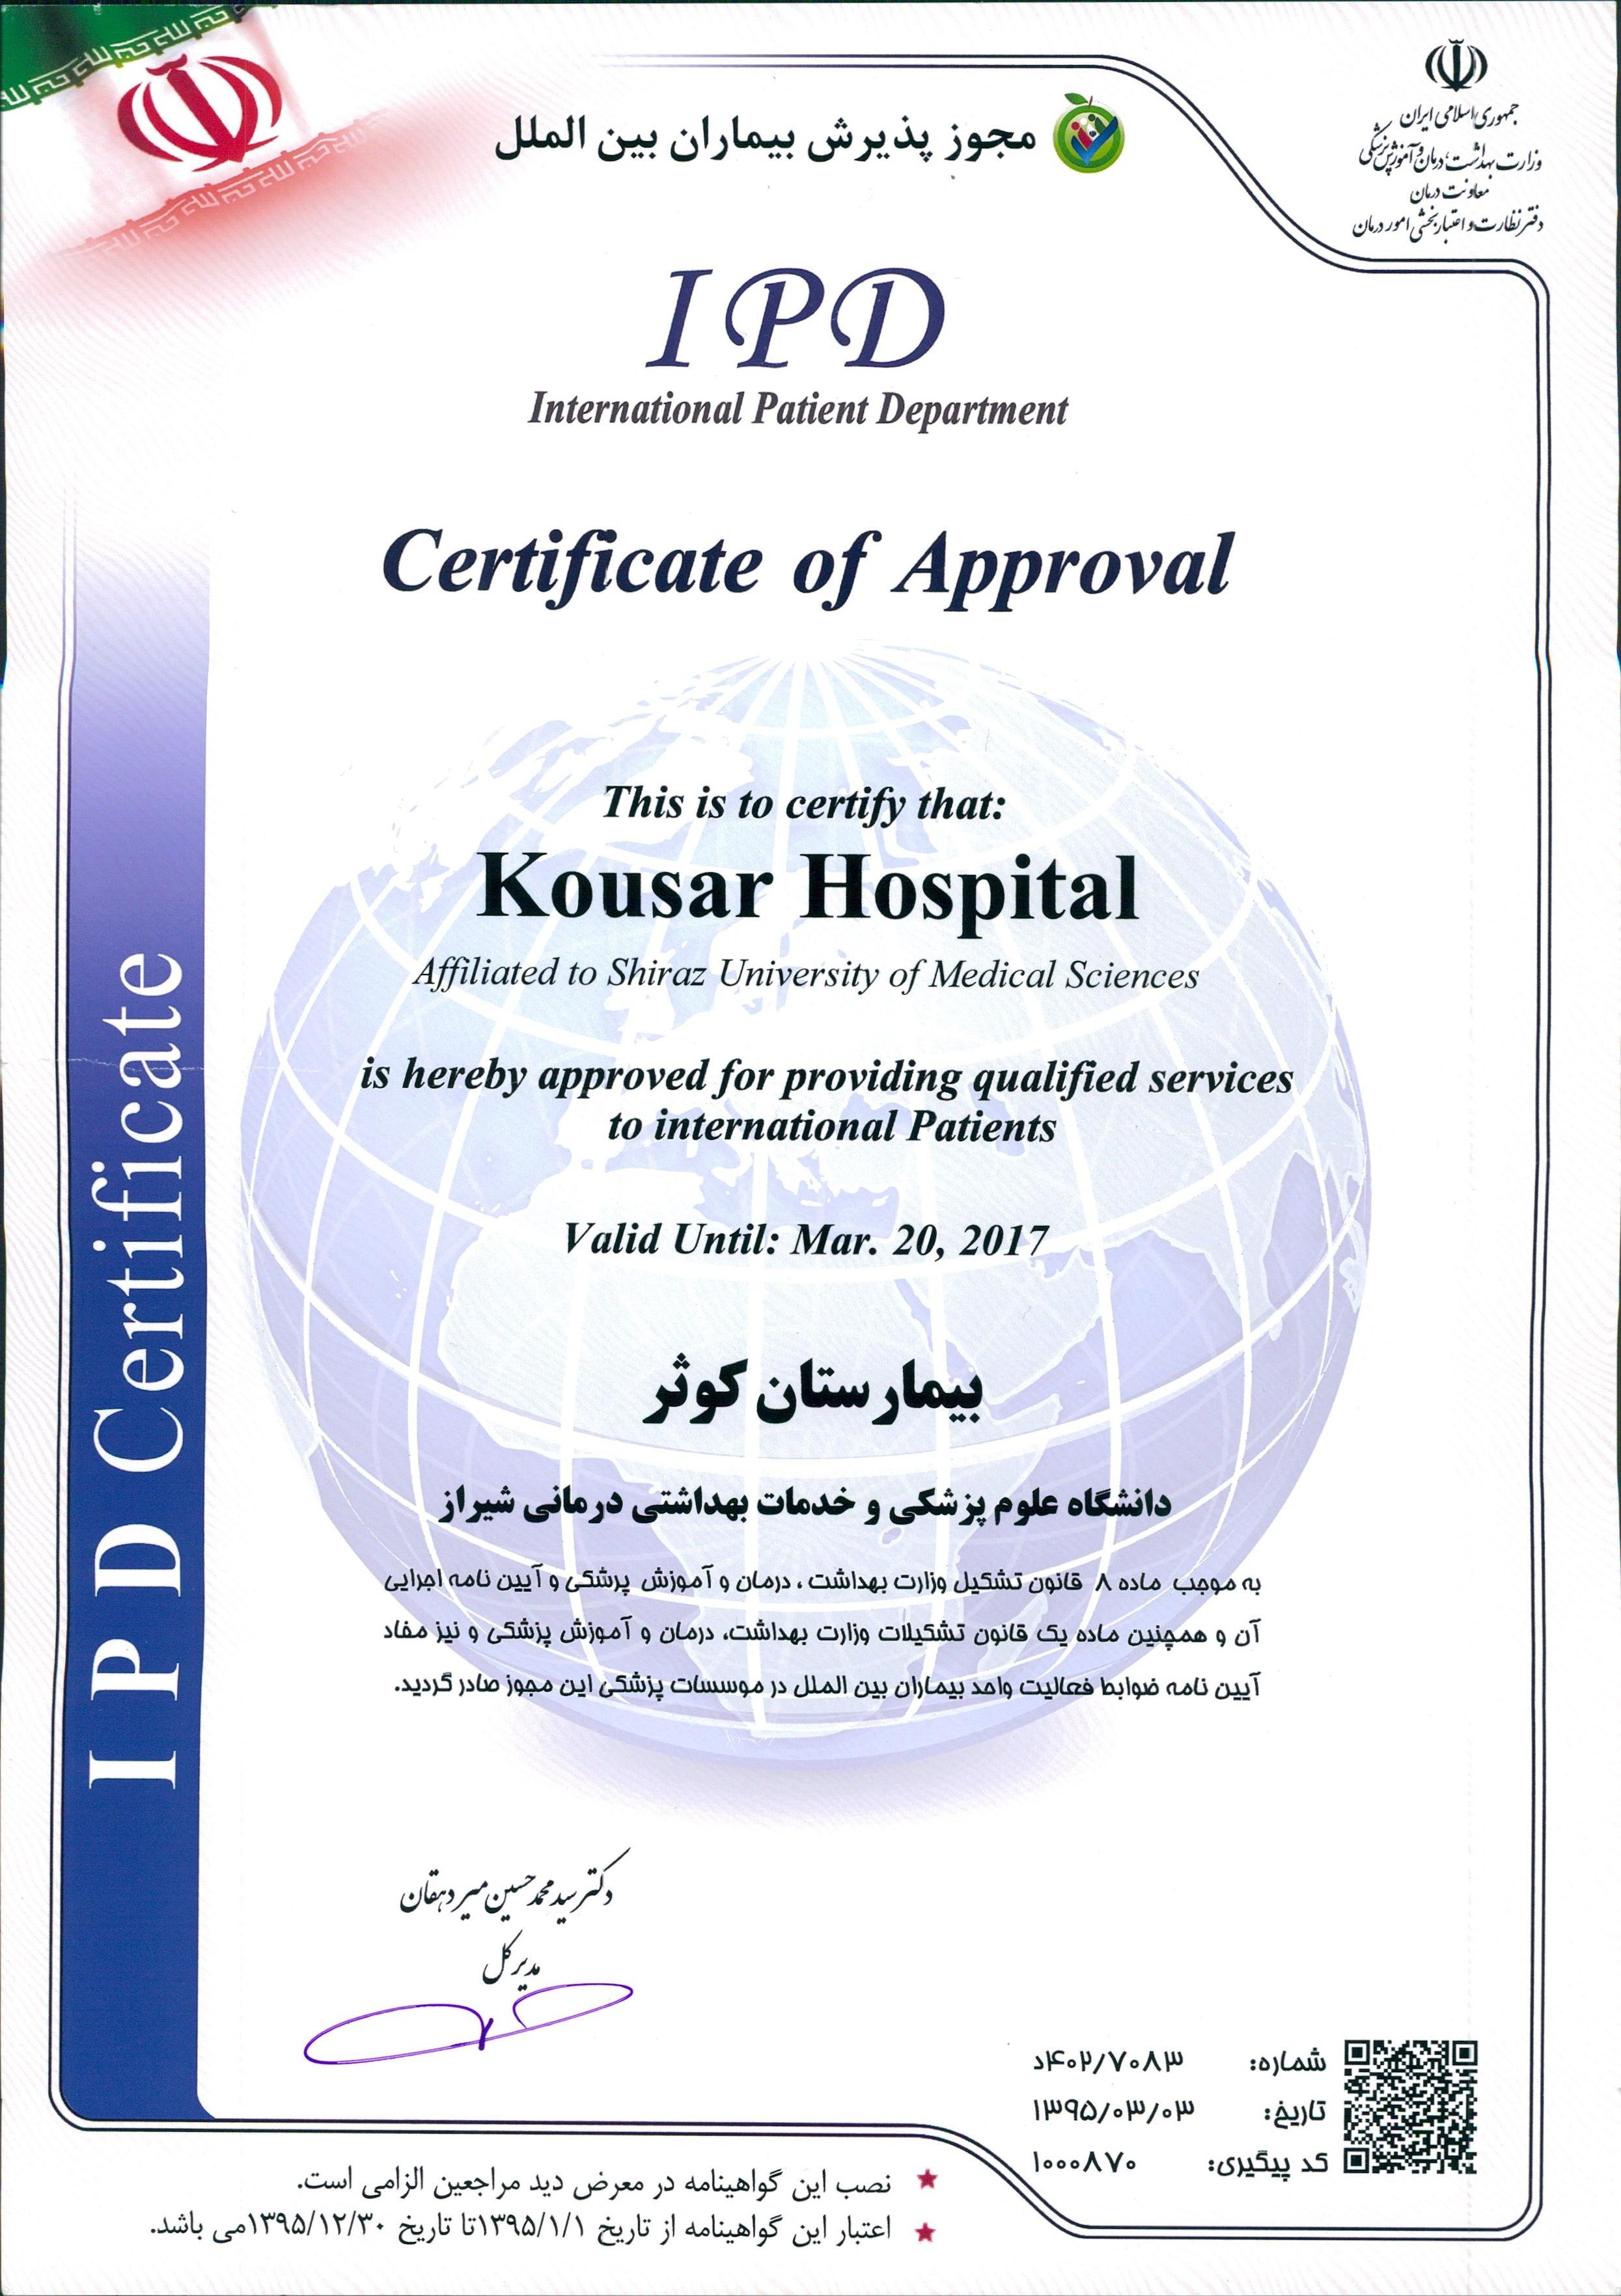 مجوز پذیرش بیماران بین الملل